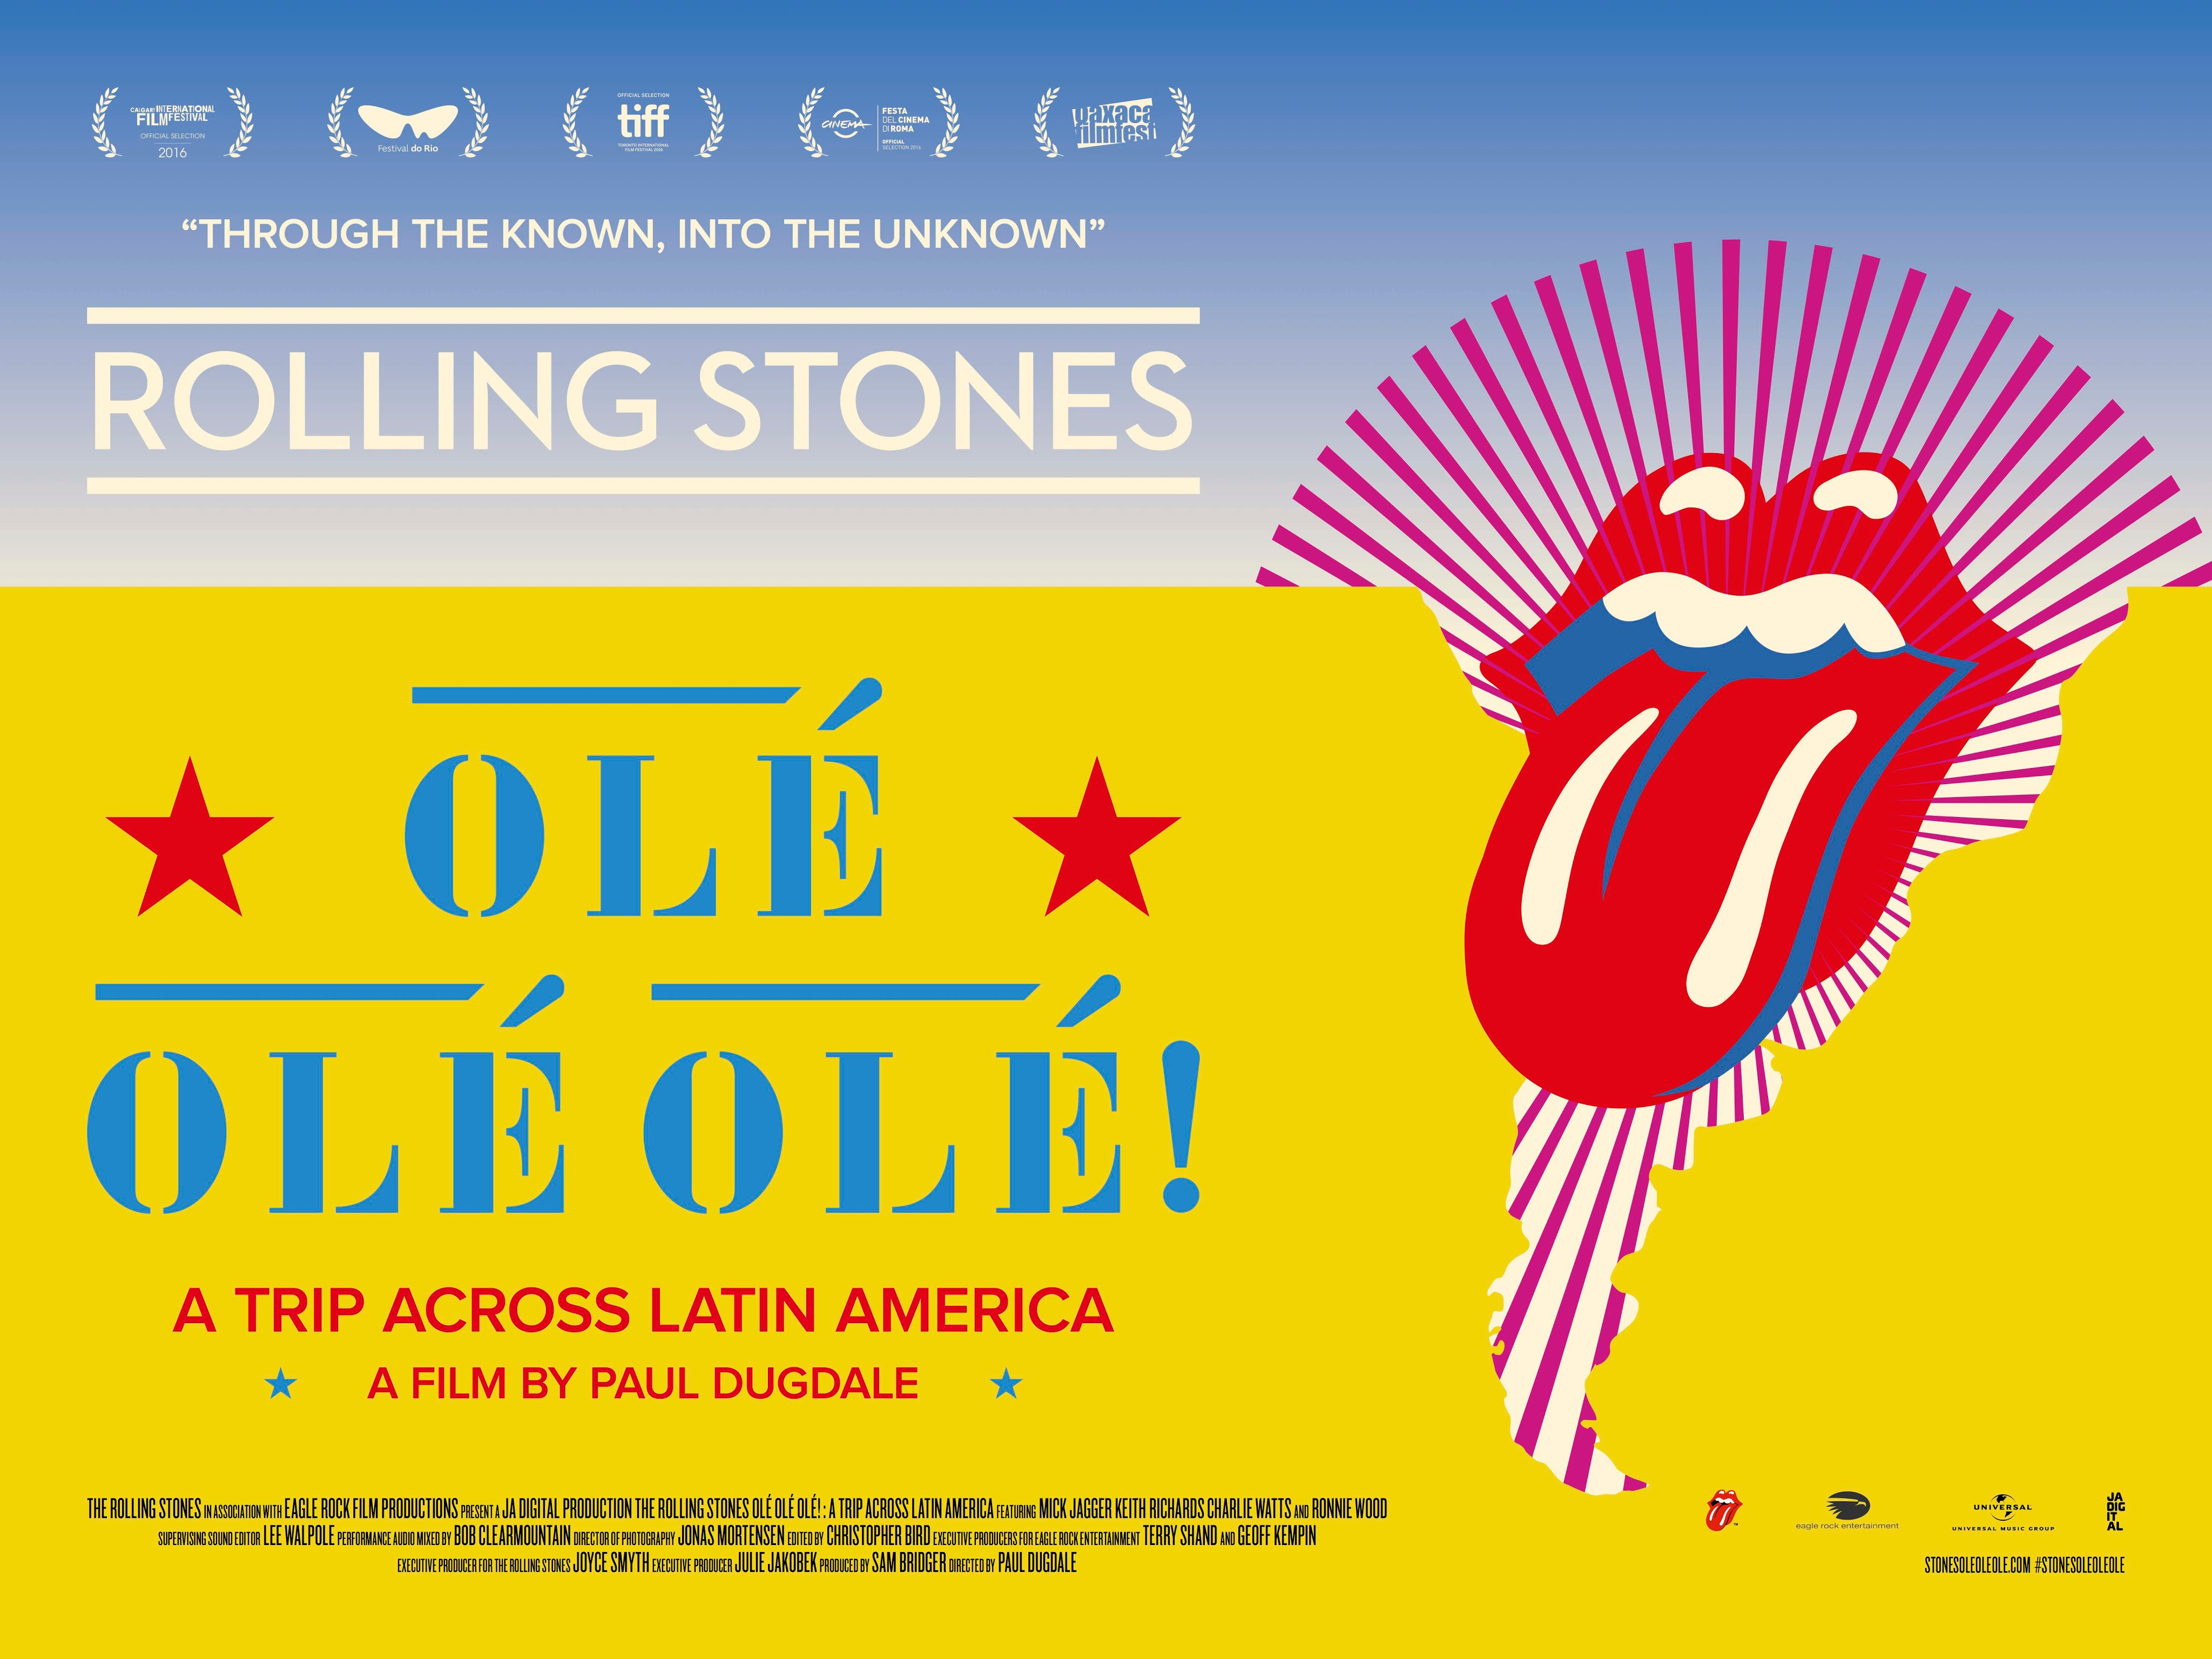 ALBUM OF THE WEEK: Rolling Stones – Ole Ole Ole